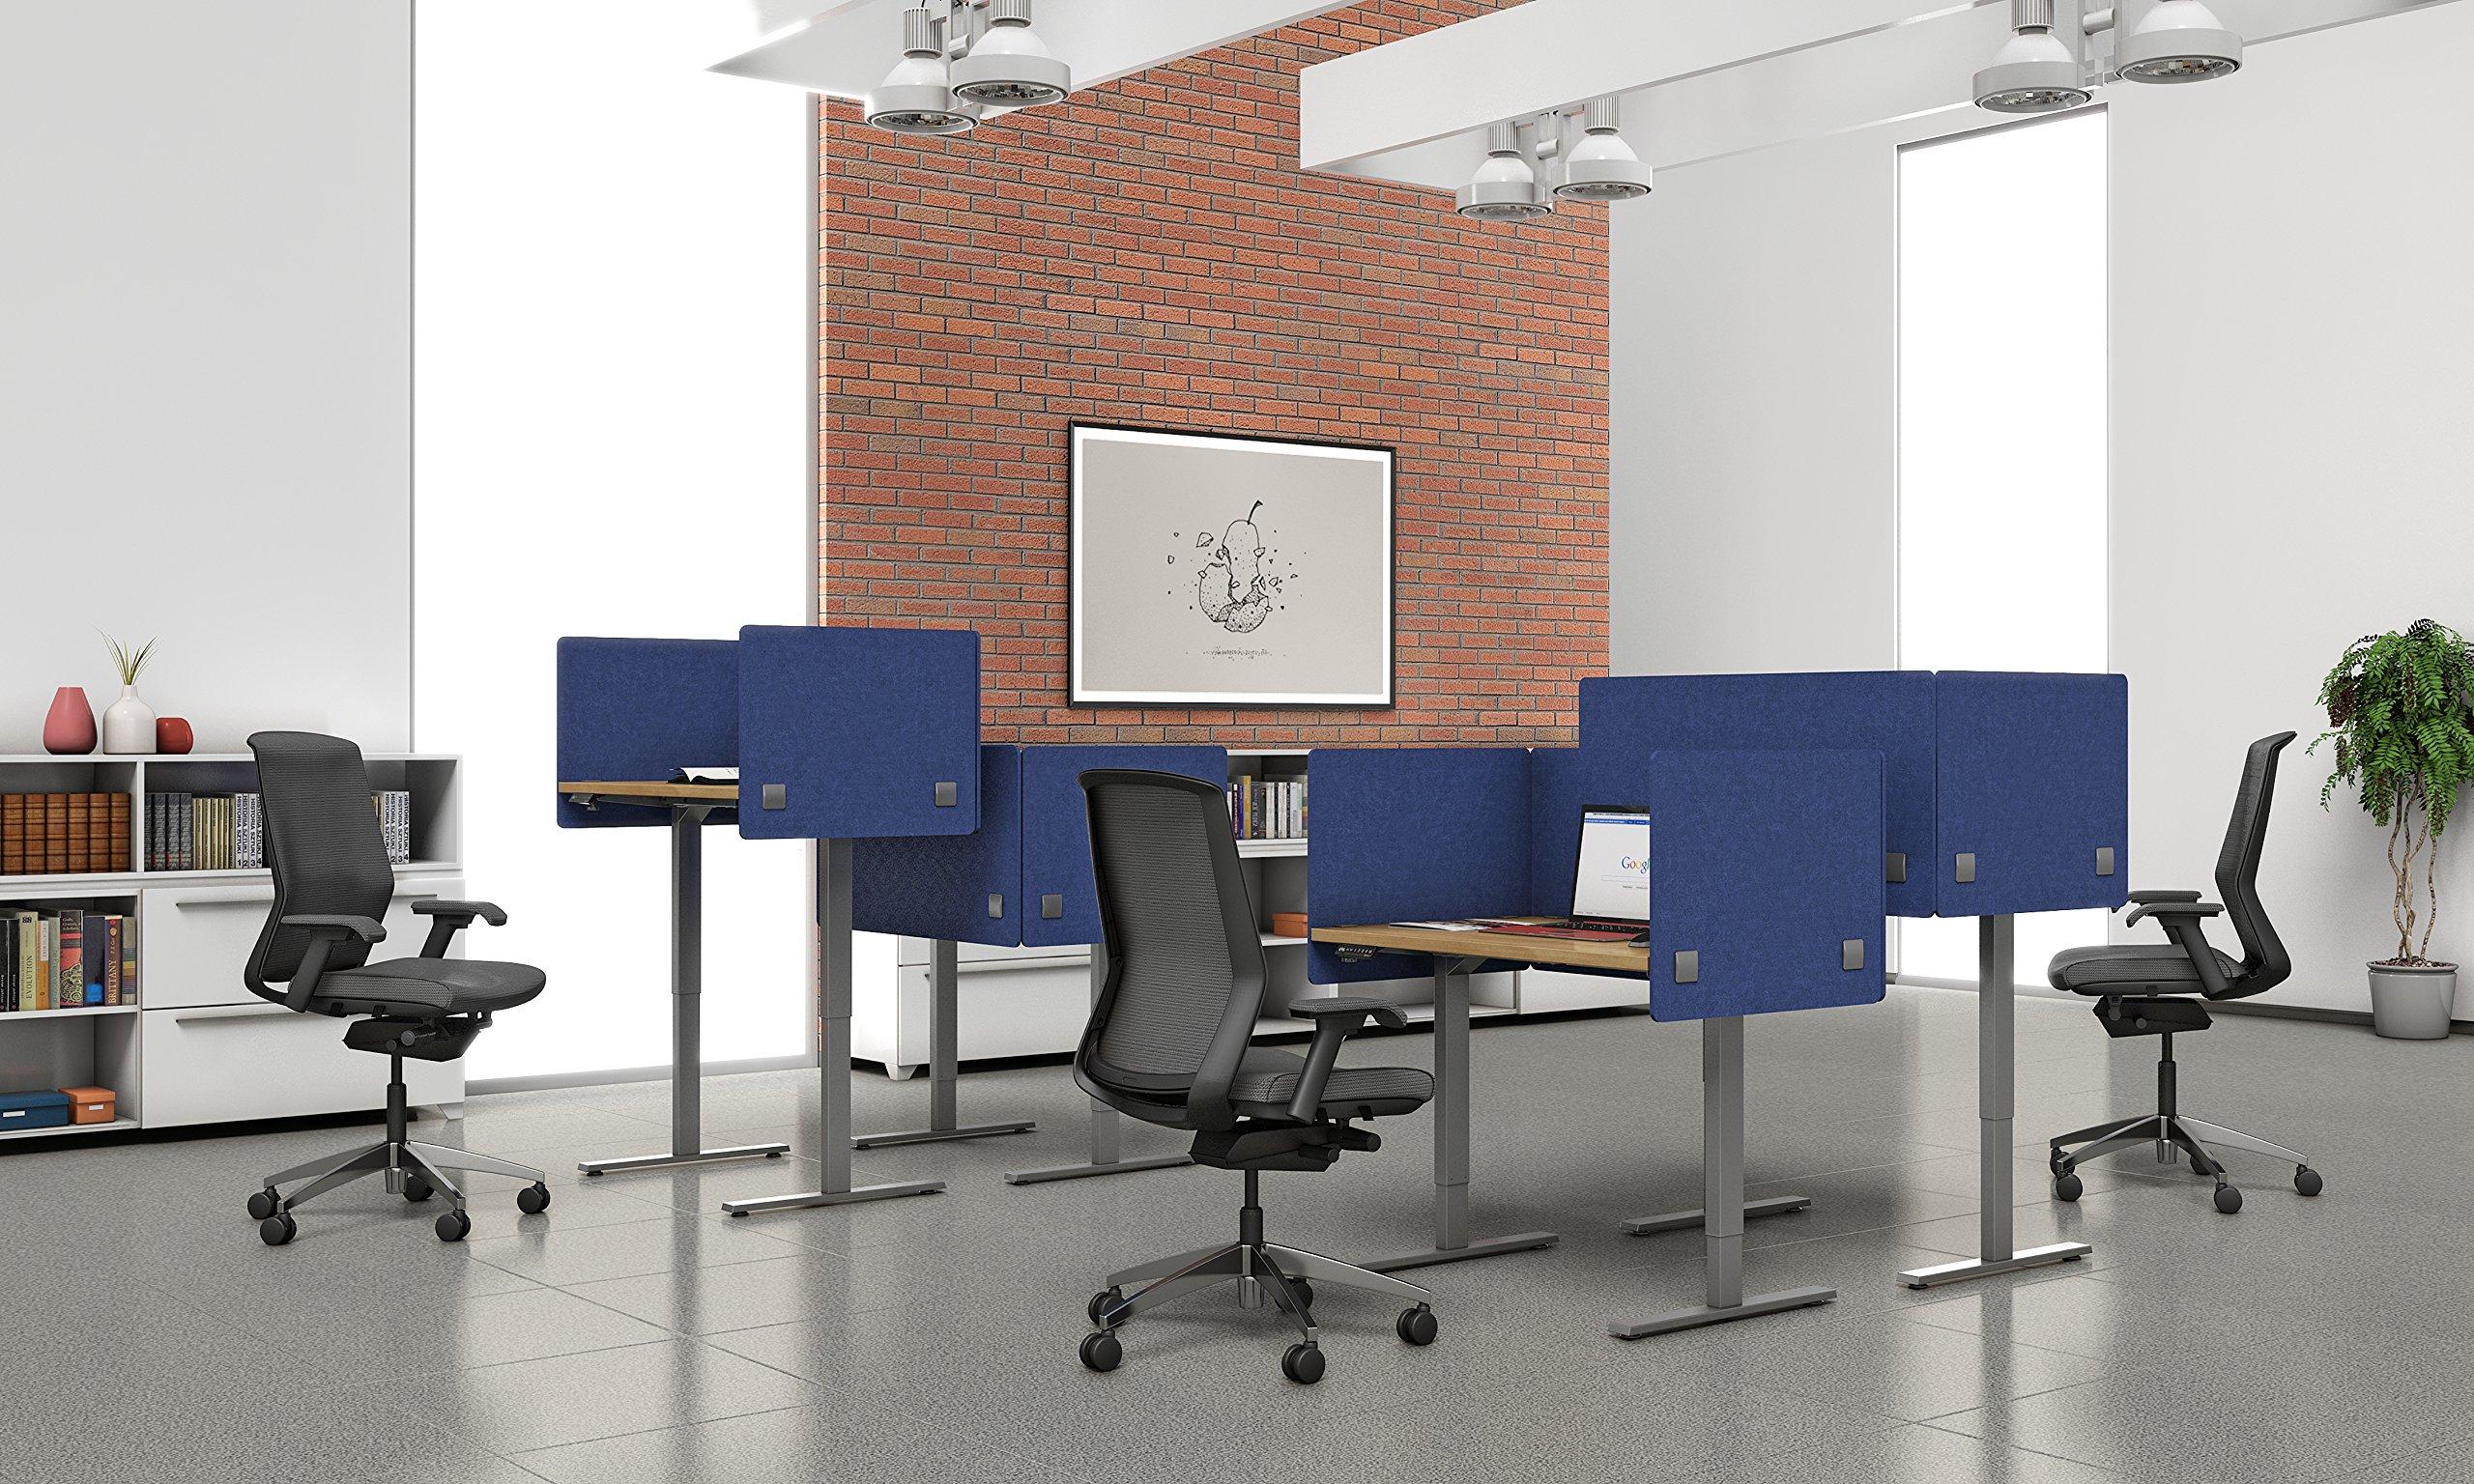 "VaRoom Acoustic Partition, Sound Absorbing Desk Divider – 48"" W x 24""H Privacy Desk Mounted Cubicle Panel, Ash Grey by VaRoom (Image #8)"